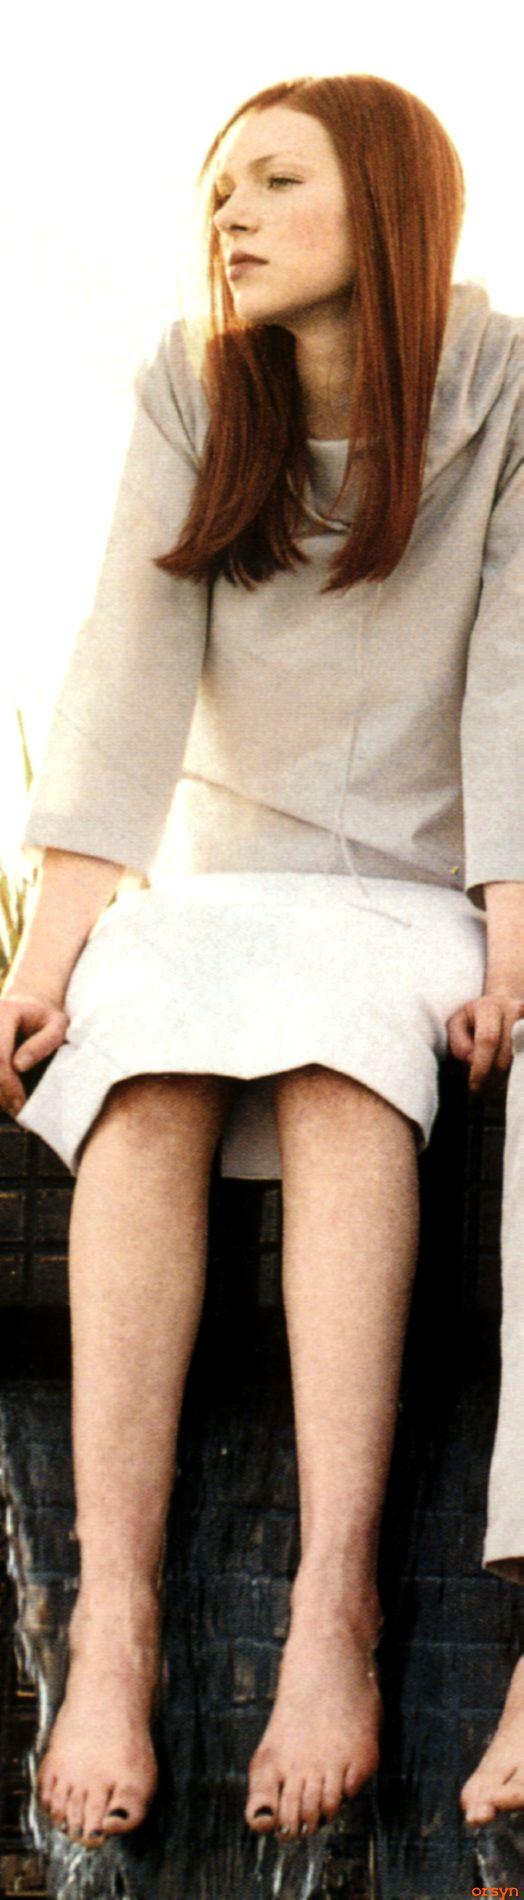 Feet laura prepon Laurel Coppock